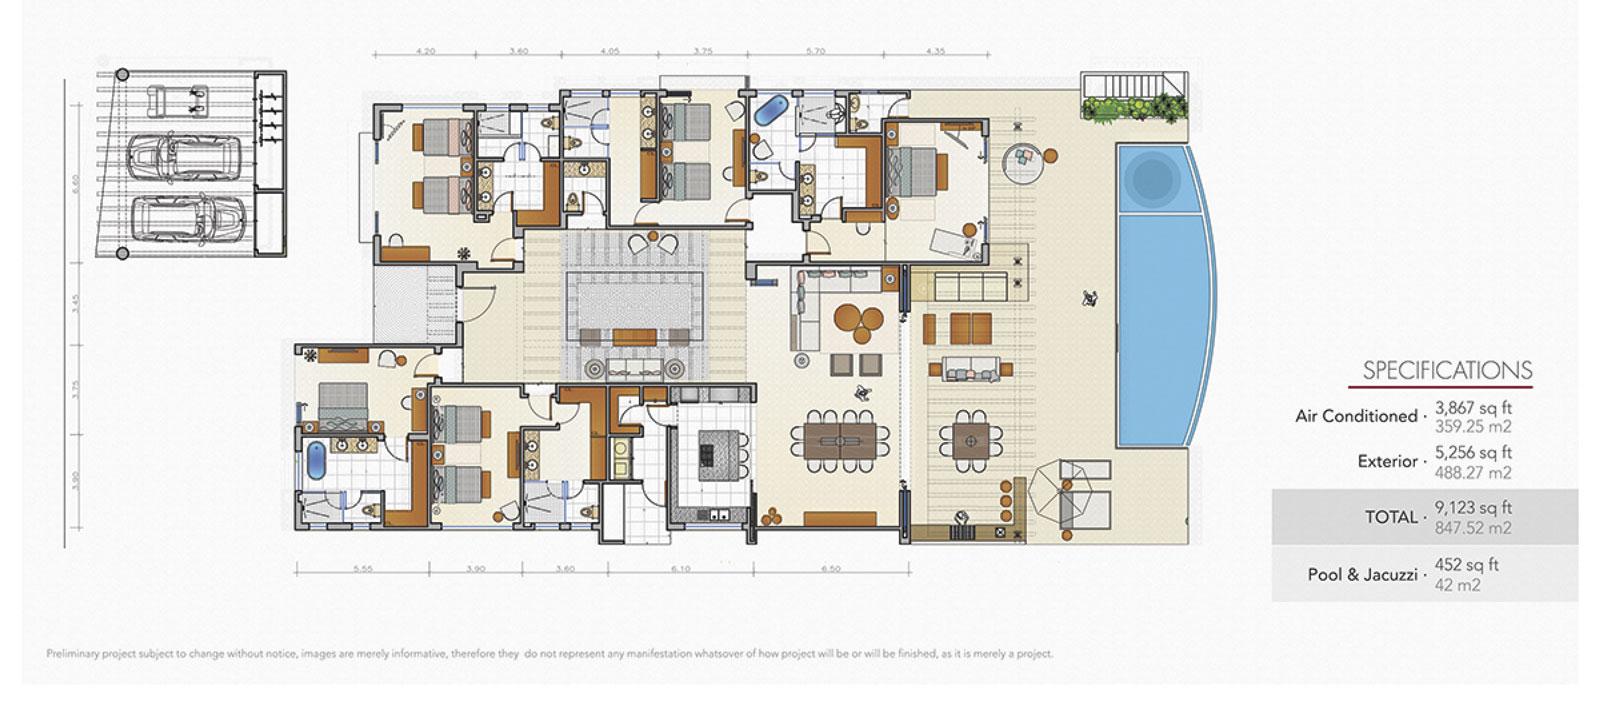 The Villas at Porta Fortuna - Punta Mita Resort Vacation Villa for Sale and Rent